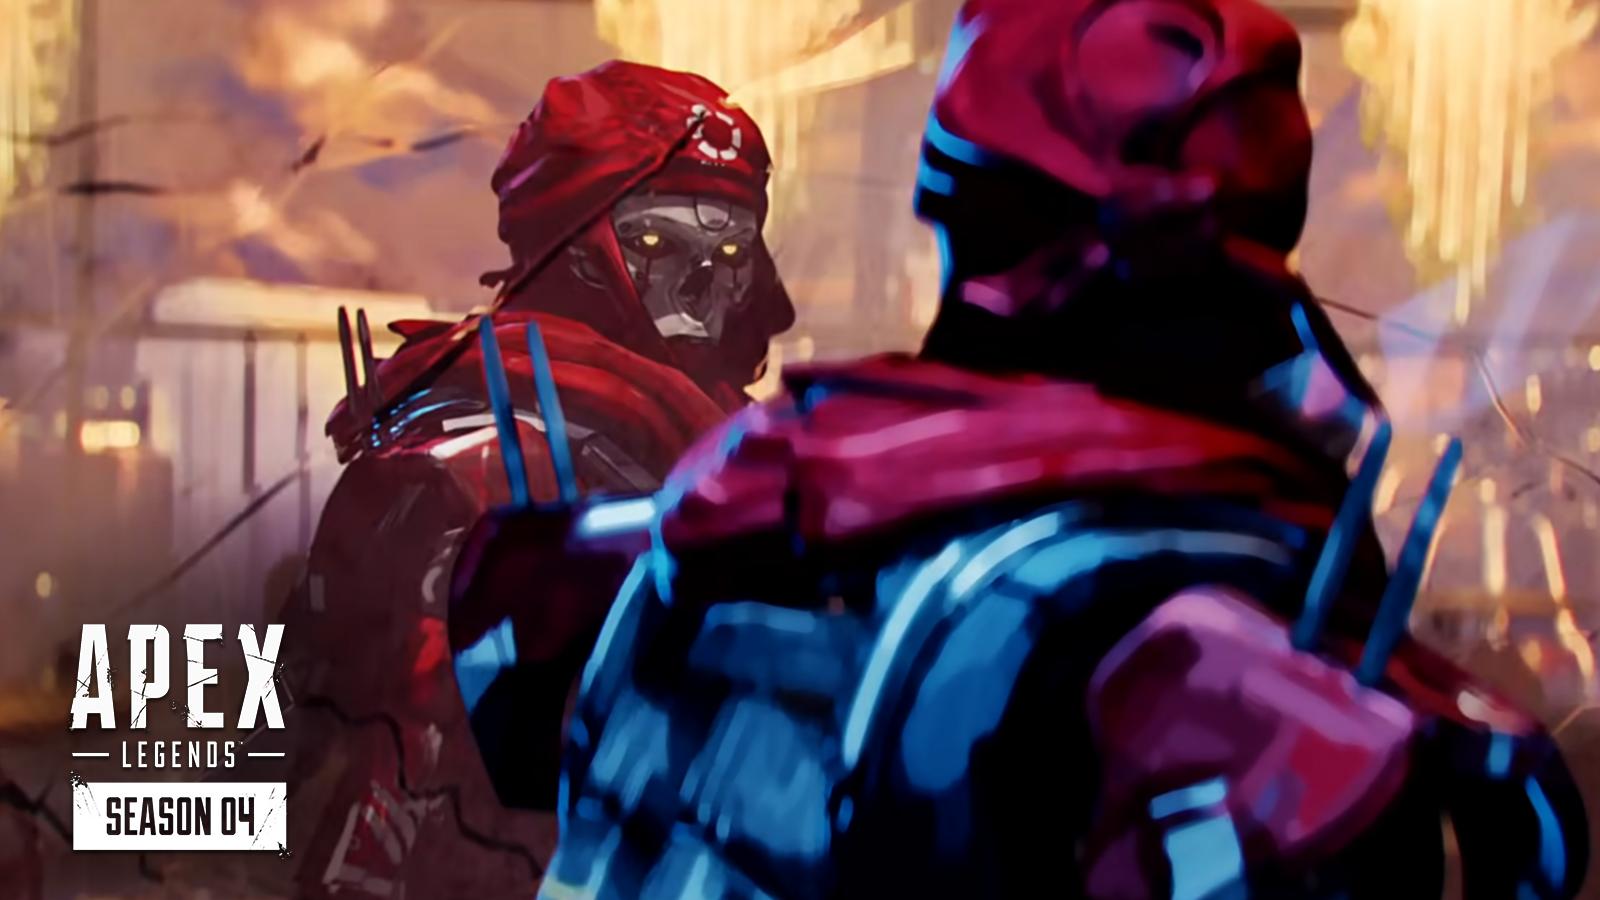 Revenant stares at a window in Apex Legends Season 4 trailer